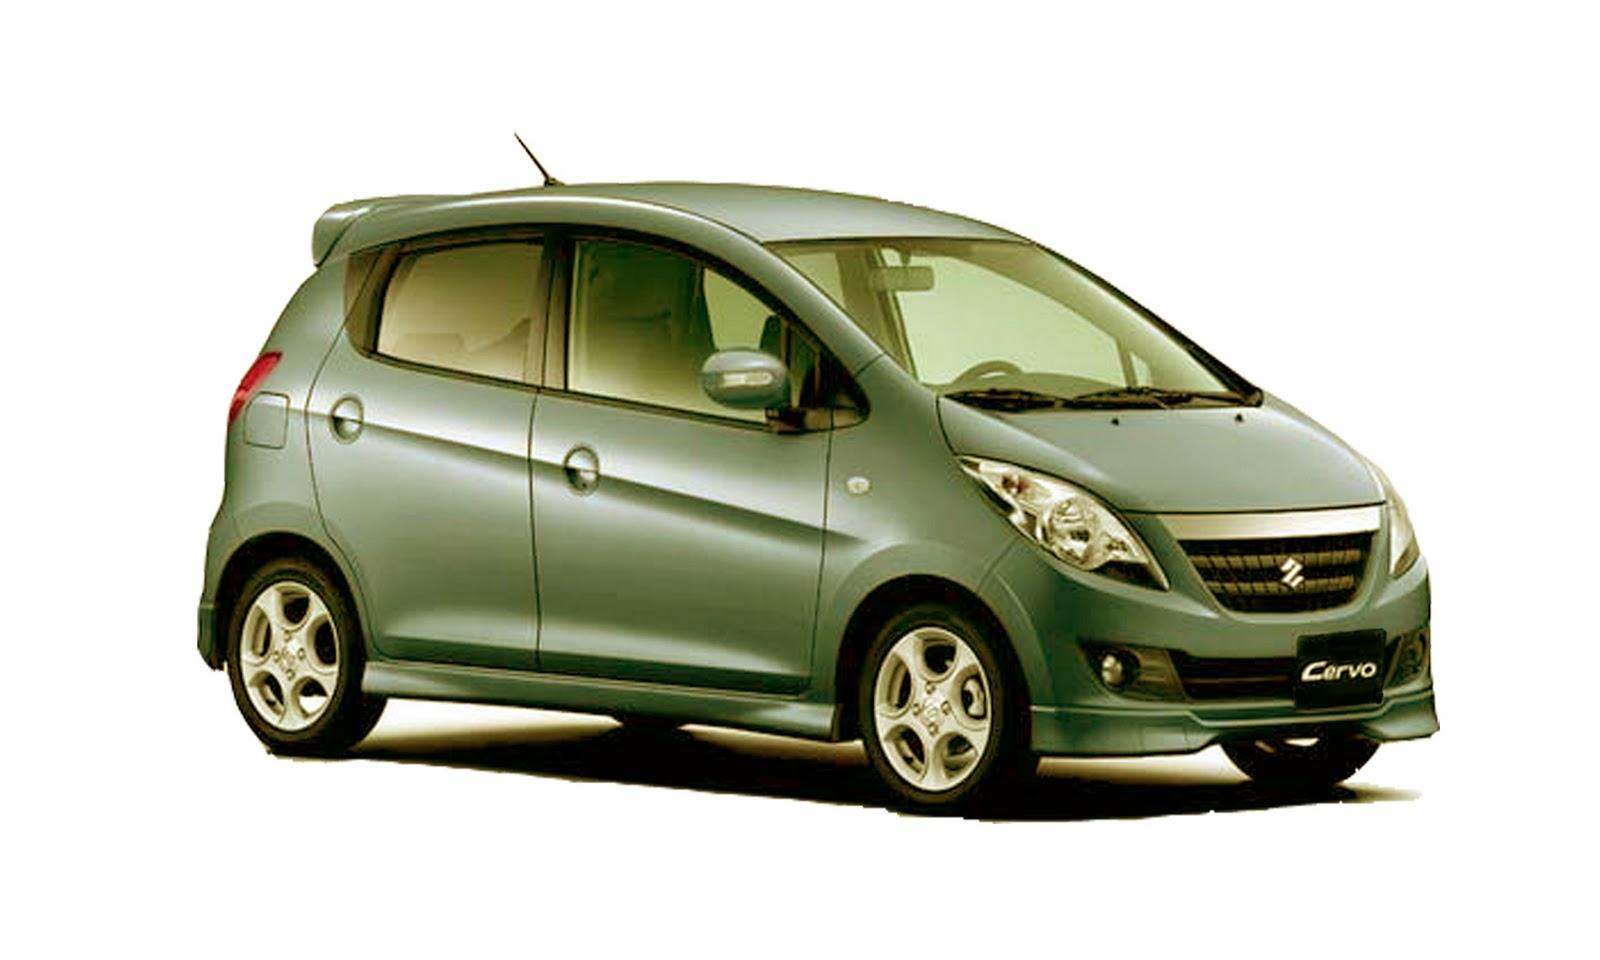 Maruti Cervo Car Details Cervo Specs Price Mileage And Features